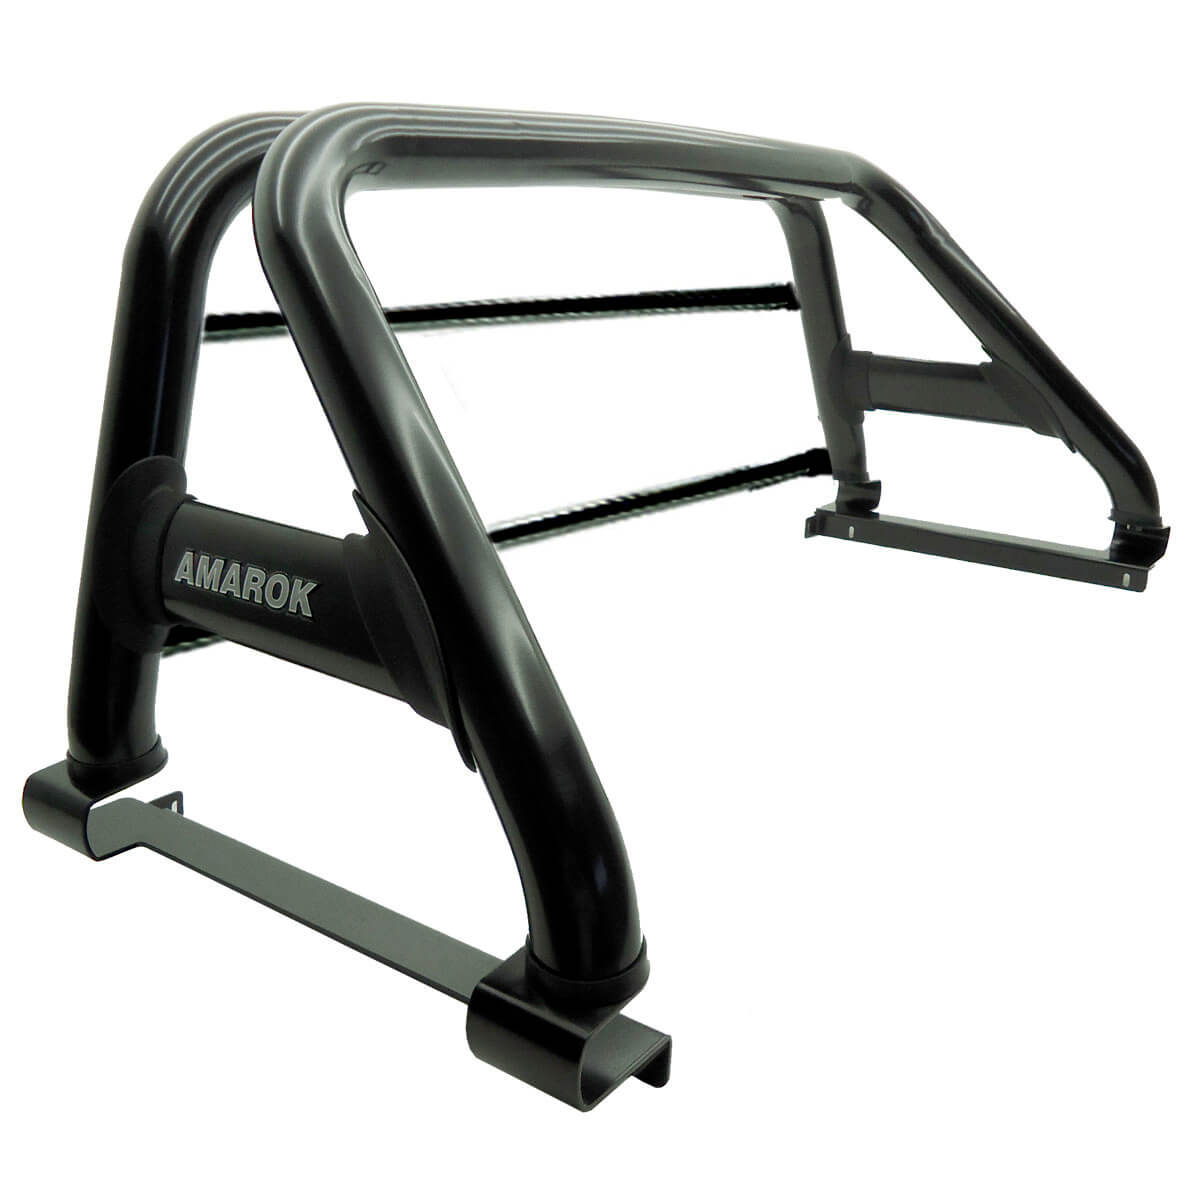 Santo antônio Track duplo preto Amarok 2011 a 2021 com barras de vidro